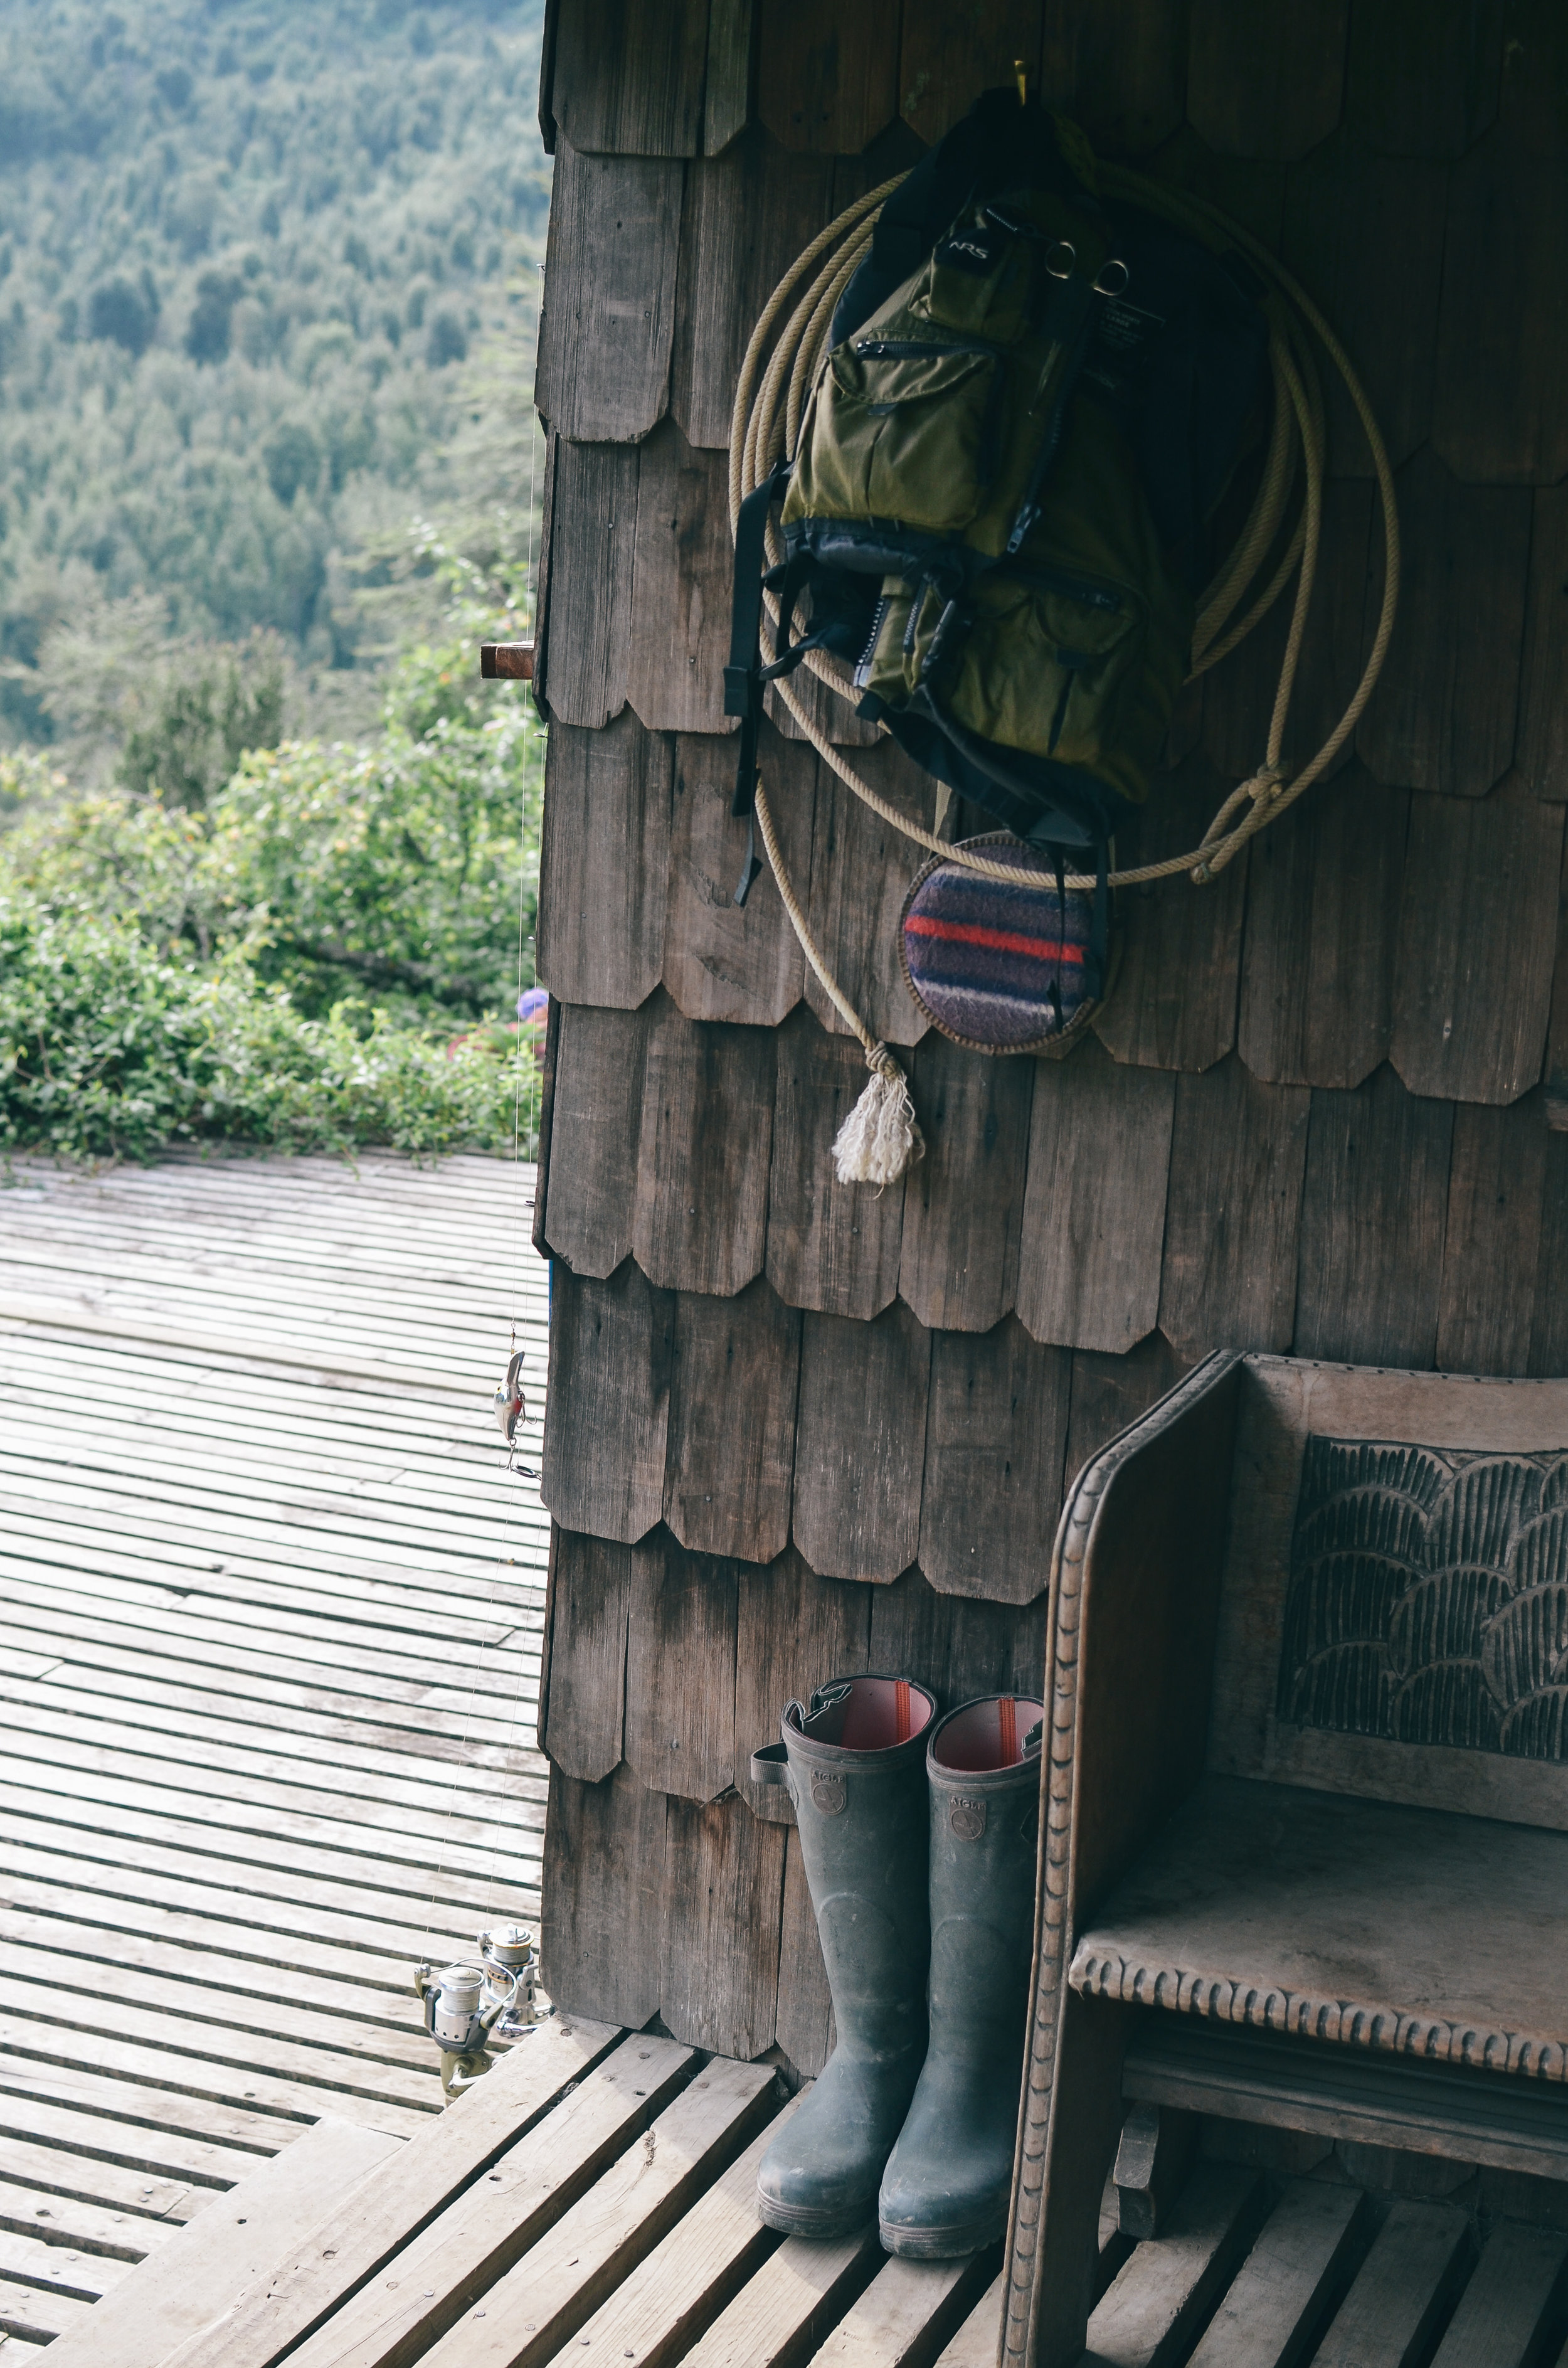 barraco+lodge+chile+life+on+pine+travel+blog+life+on+pine_DSC_0059.jpg